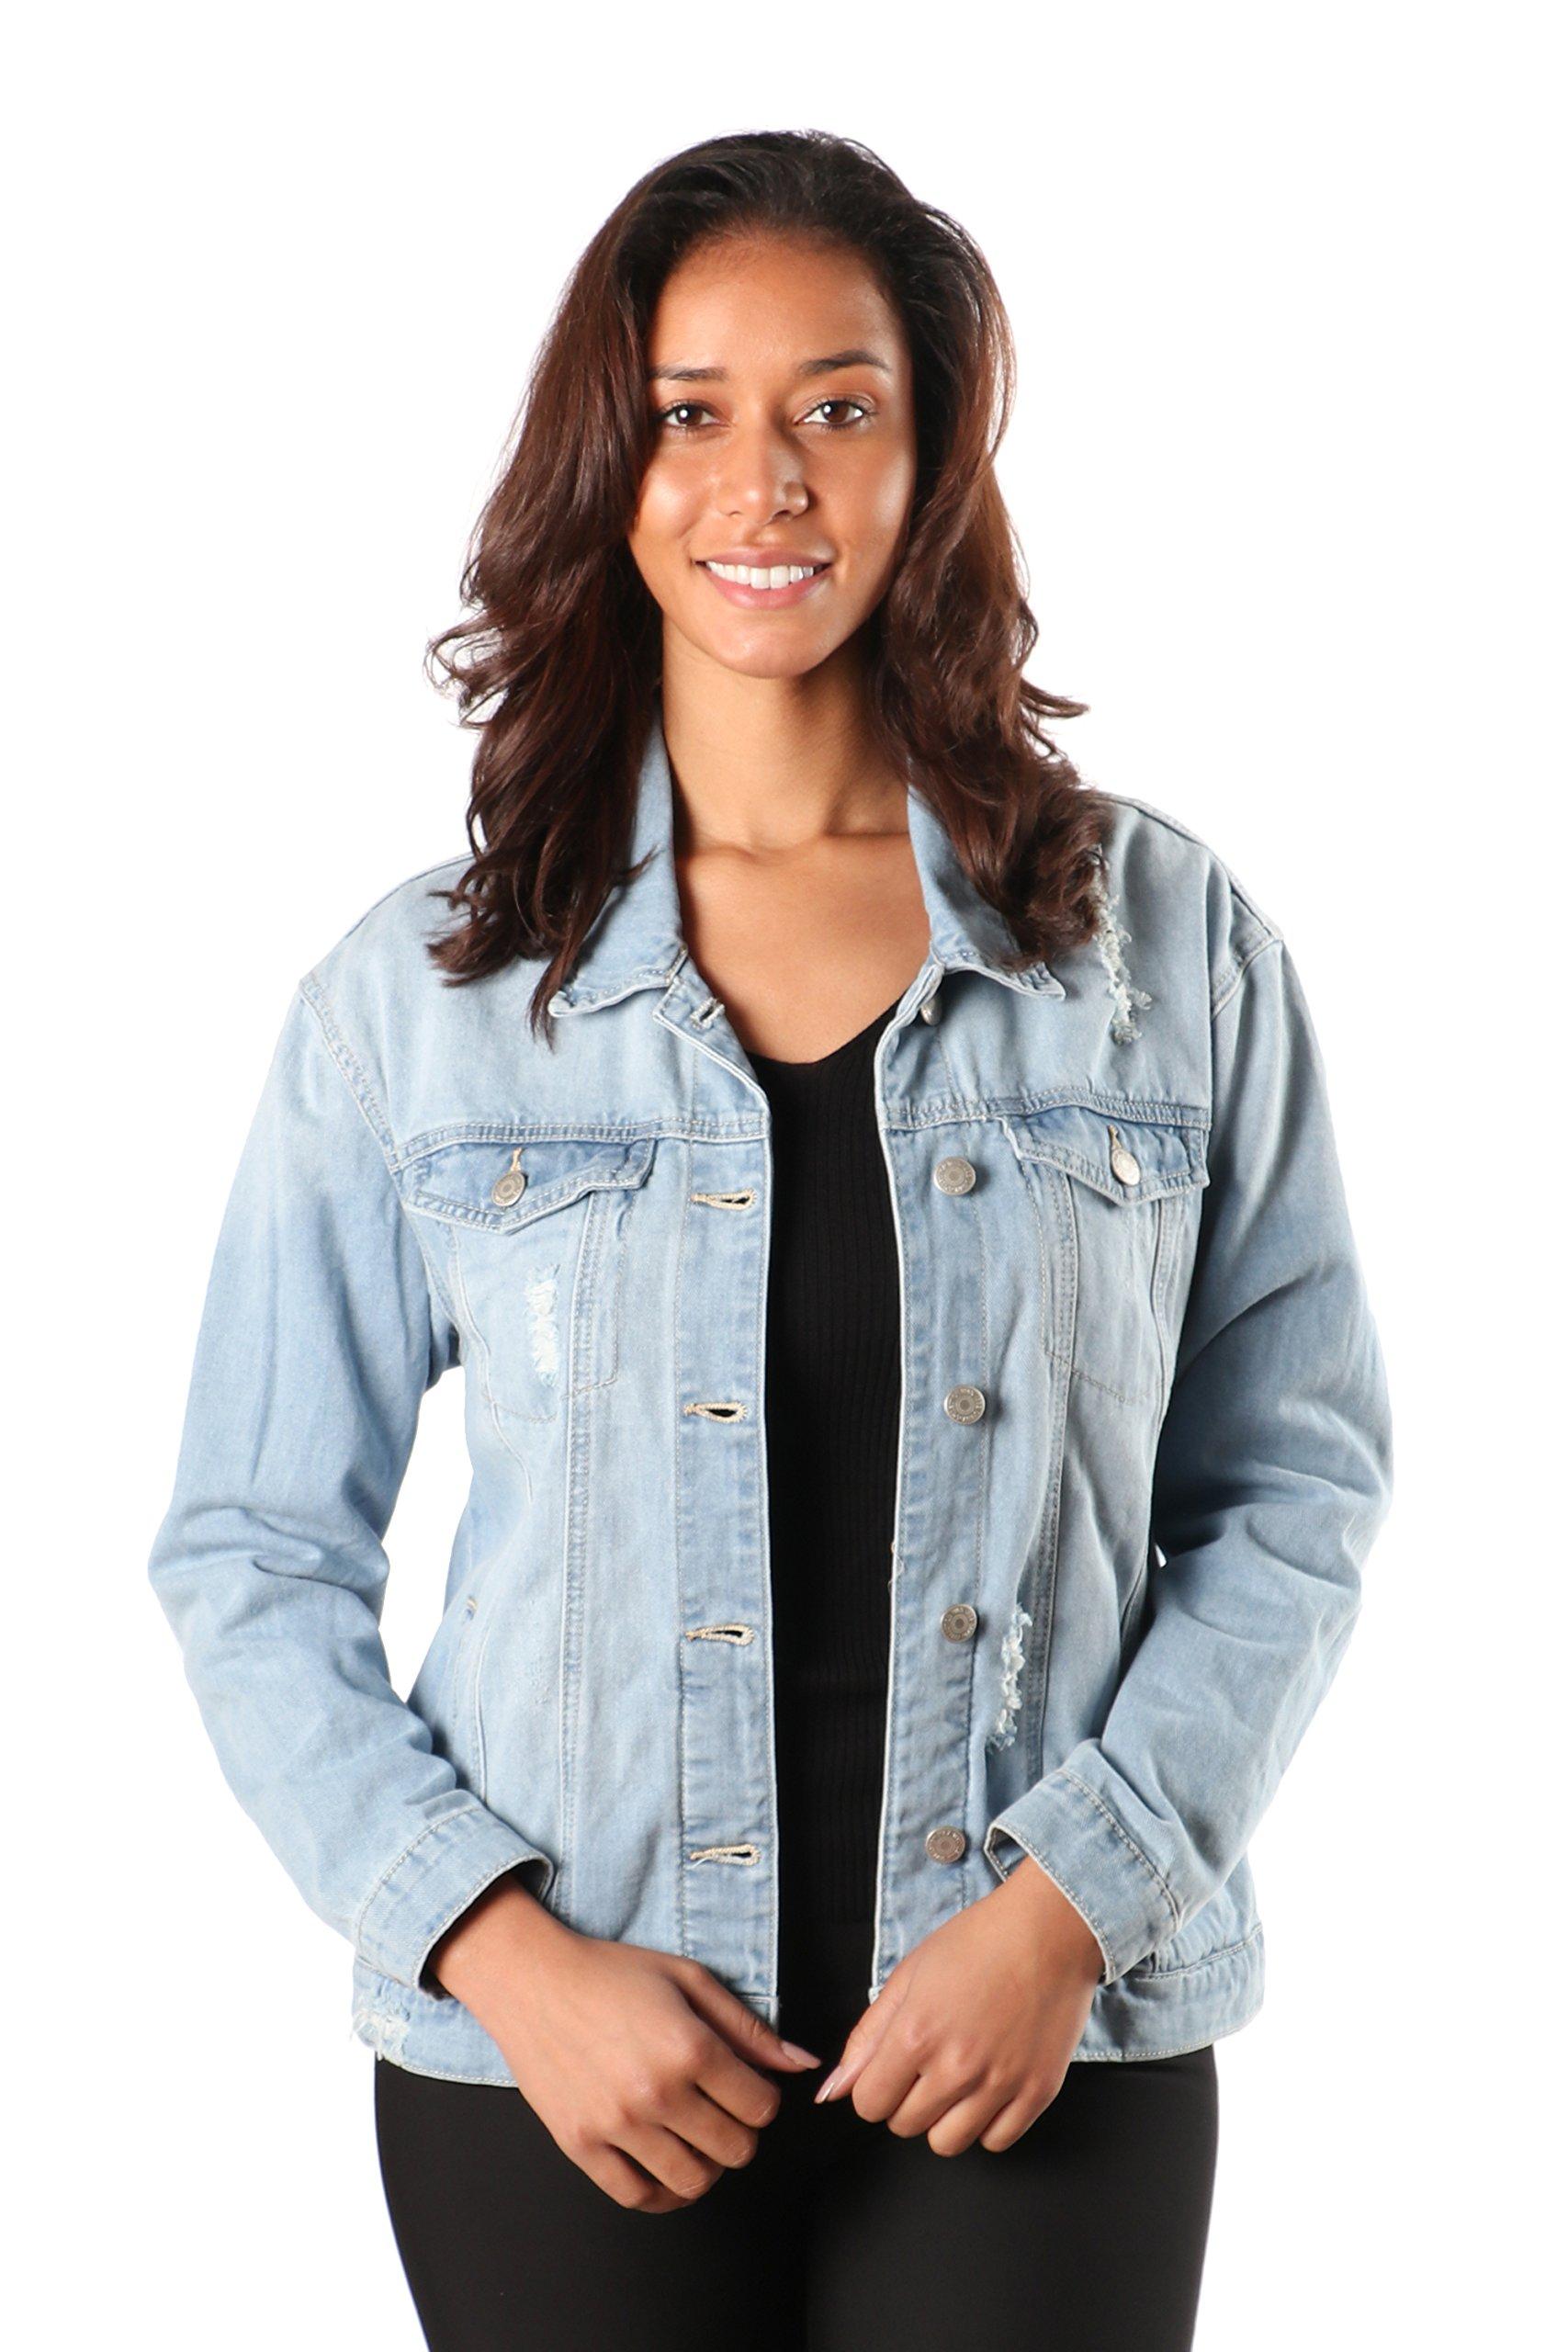 SWTD Womens Classic Style Vintage Destroyed Accent Button Down Denim Trucker Jackets (Small, Light DENIM-90091)